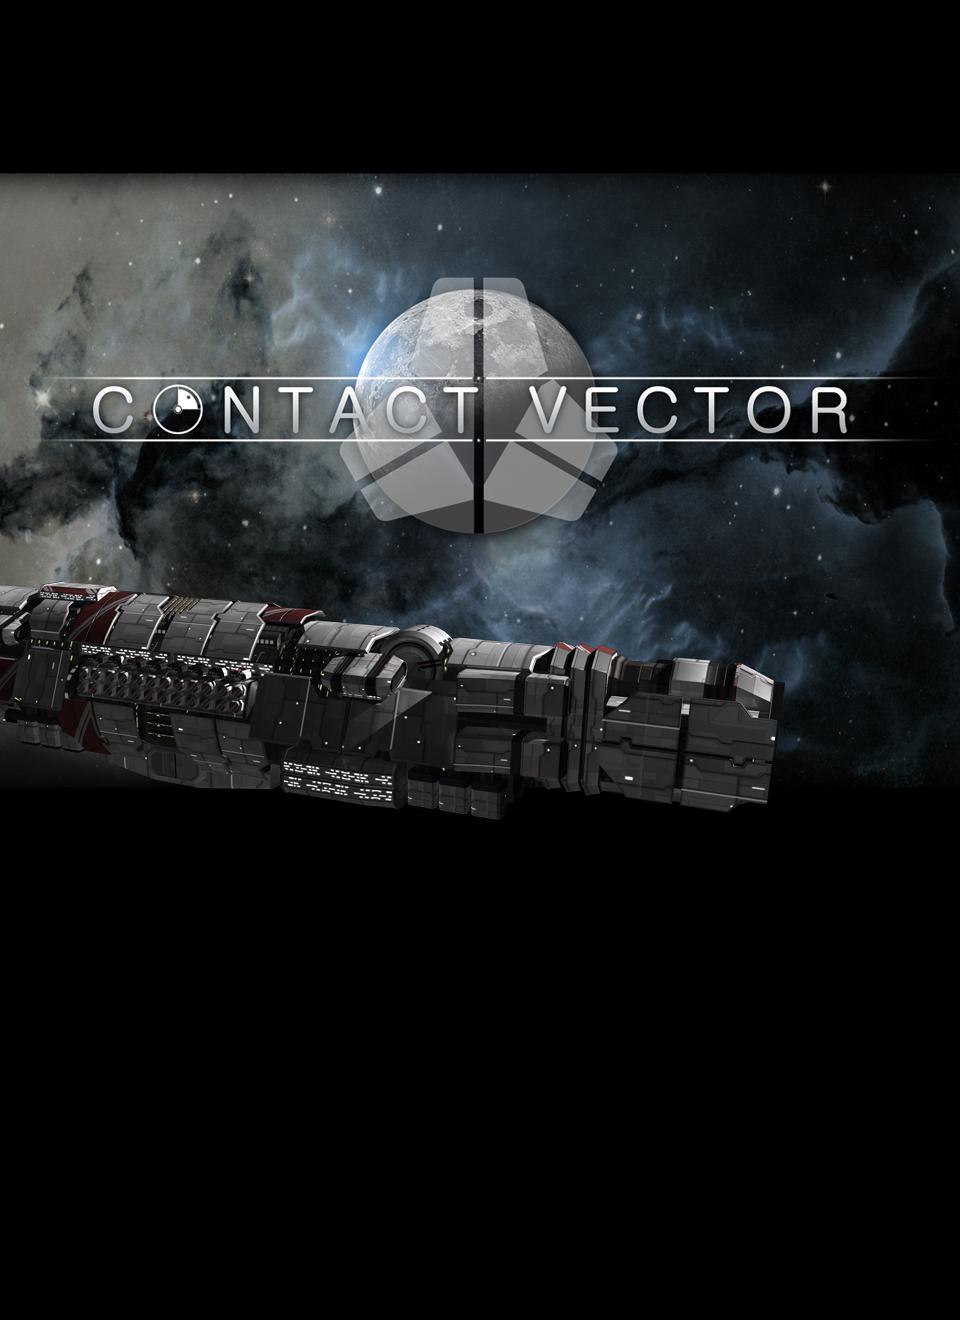 Contact Vector Windows, Mac, Linux game - Mod DB